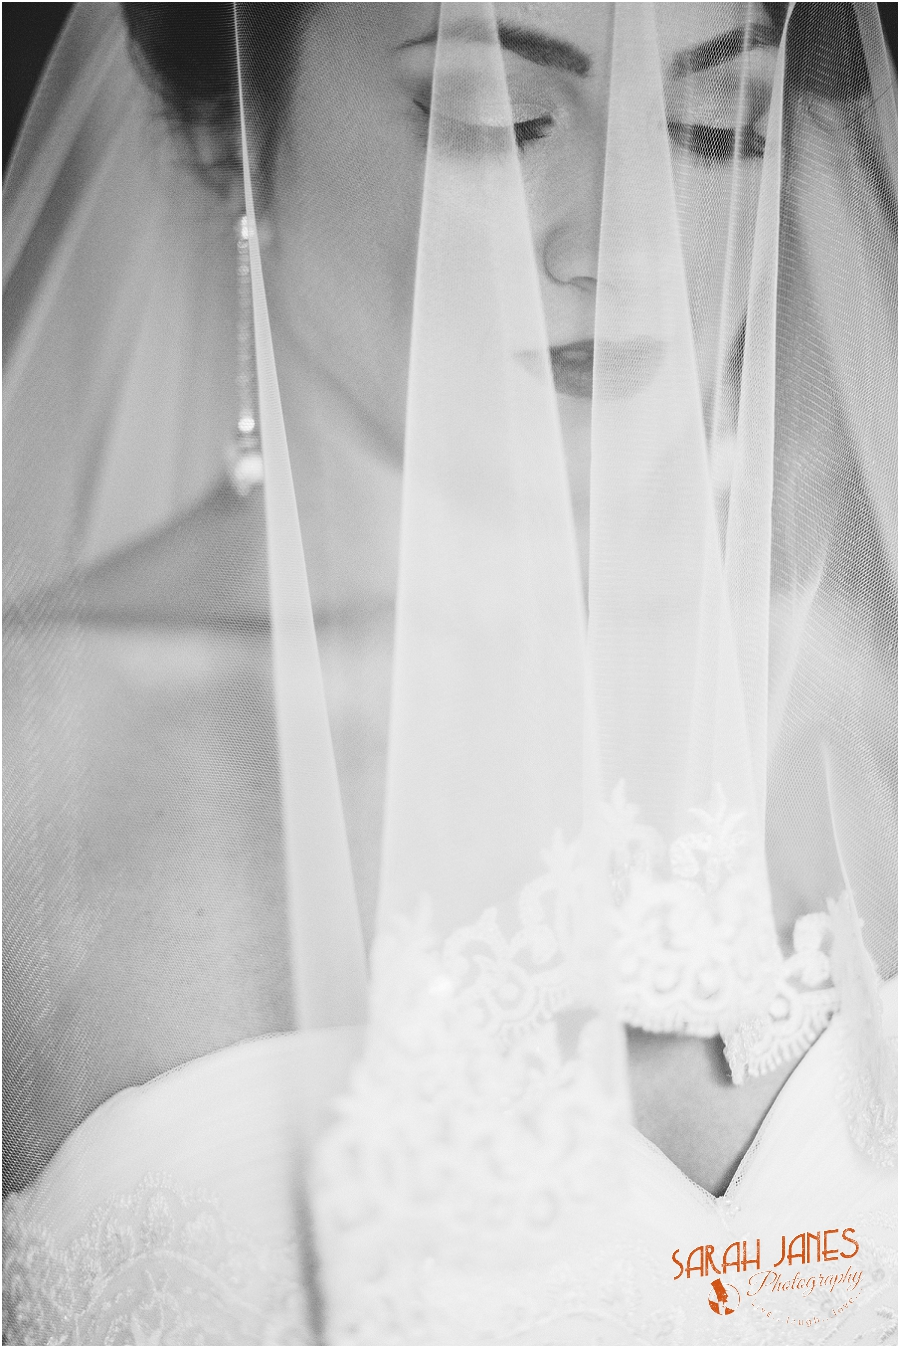 Oddfellows Wedding Photography, Quirky Wedding photography, Documentry Wedding Photography, Sarah Janes Photography,_0006.jpg